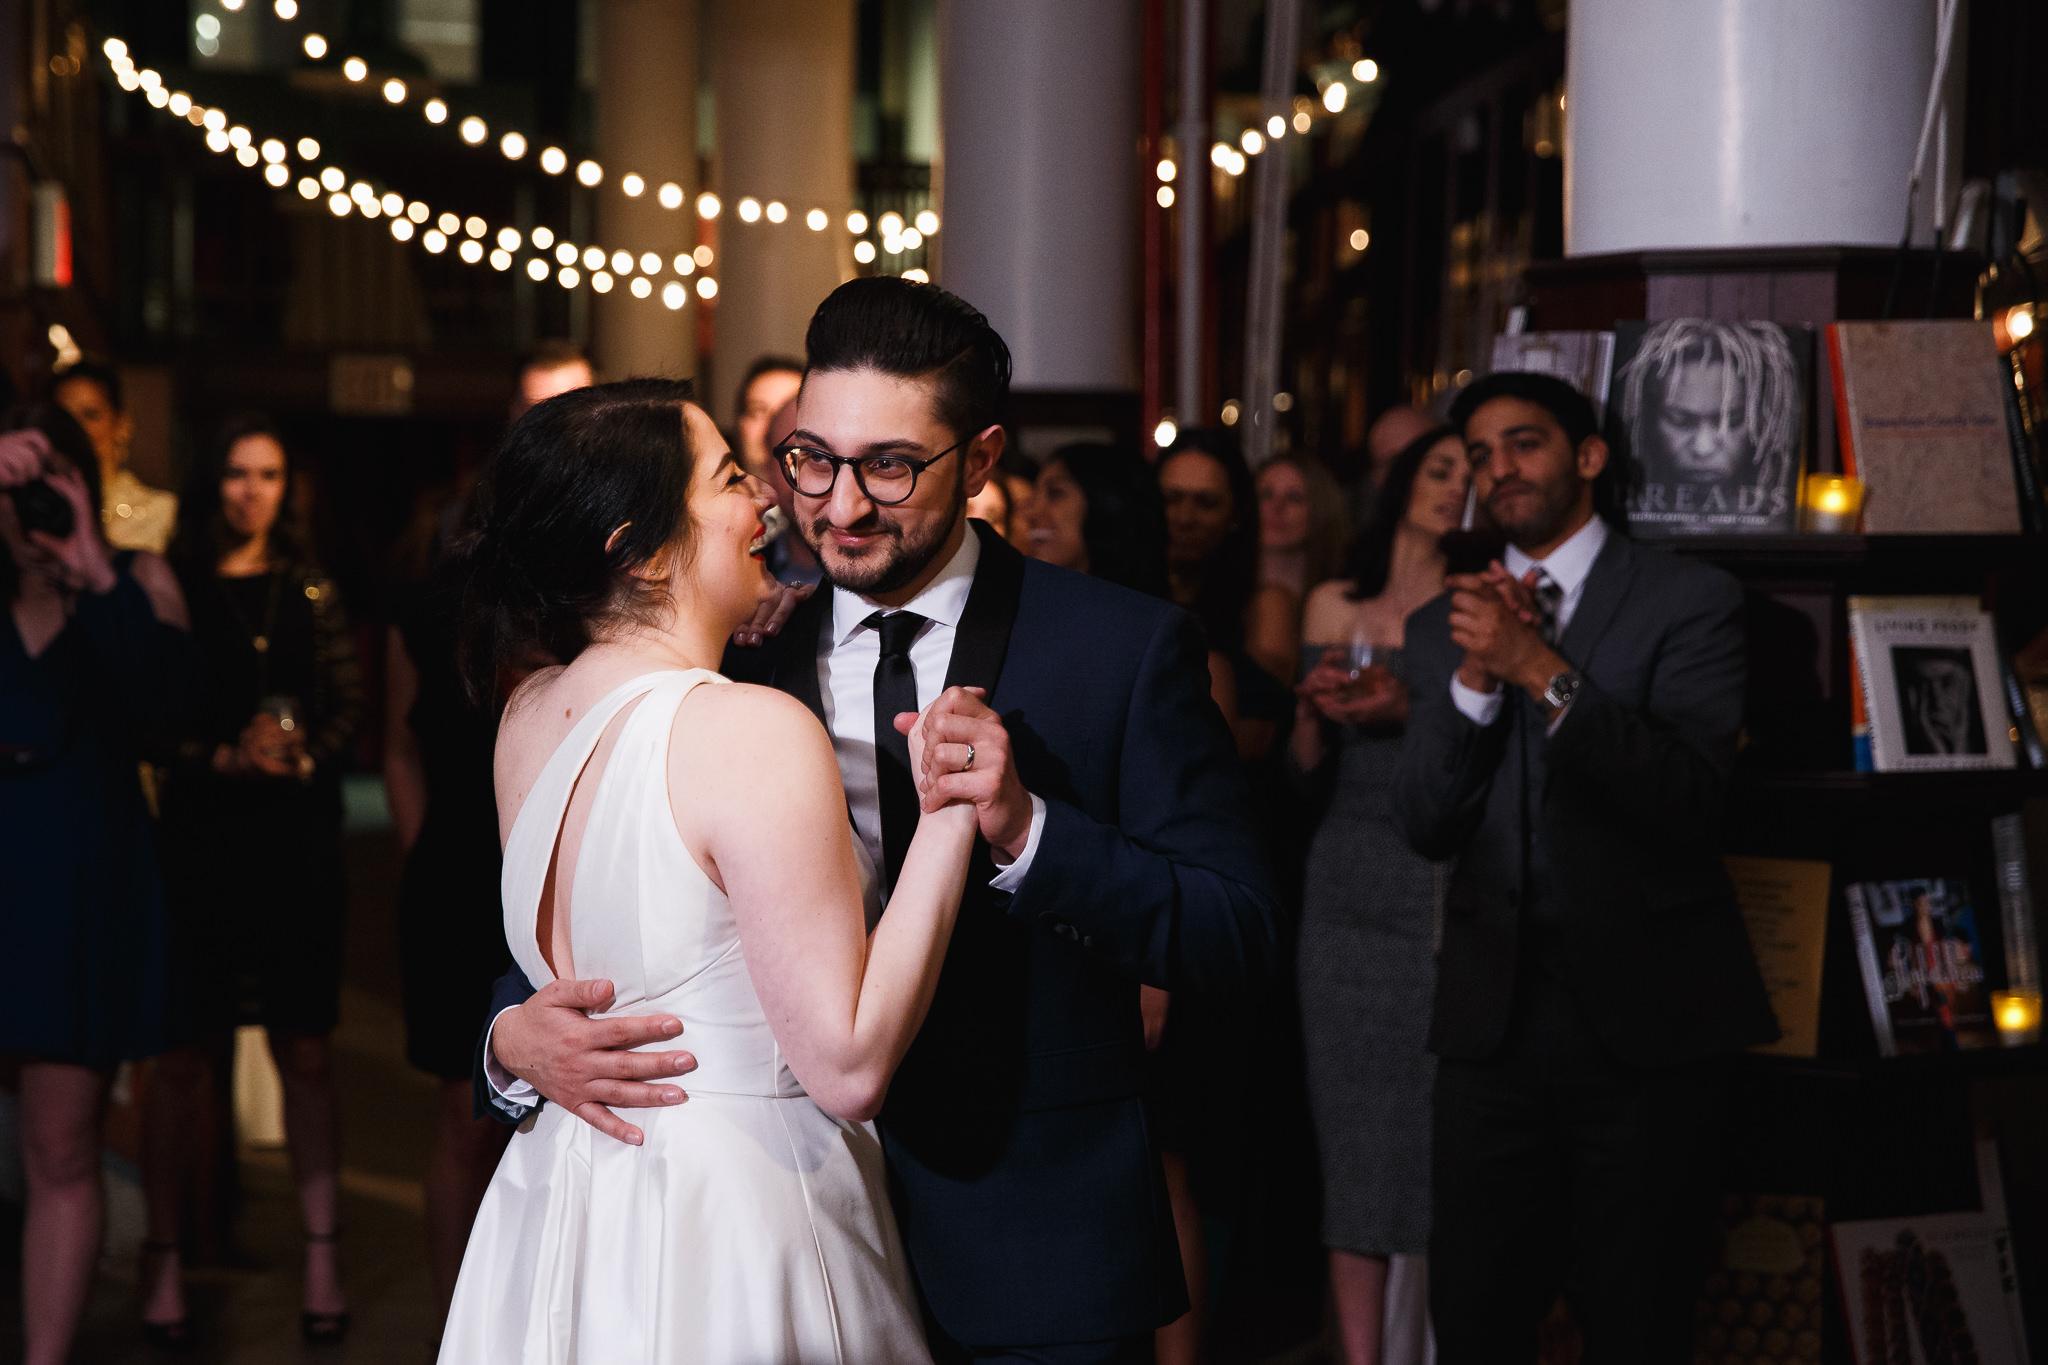 New York Wedding Photographer, Soho Wedding Photographer, Housing Works Bookstore Wedding, New York City Wedding, Brooklyn Wedding Photographer, Spring Wedding Inspiration, Winter Wedding Inspiration